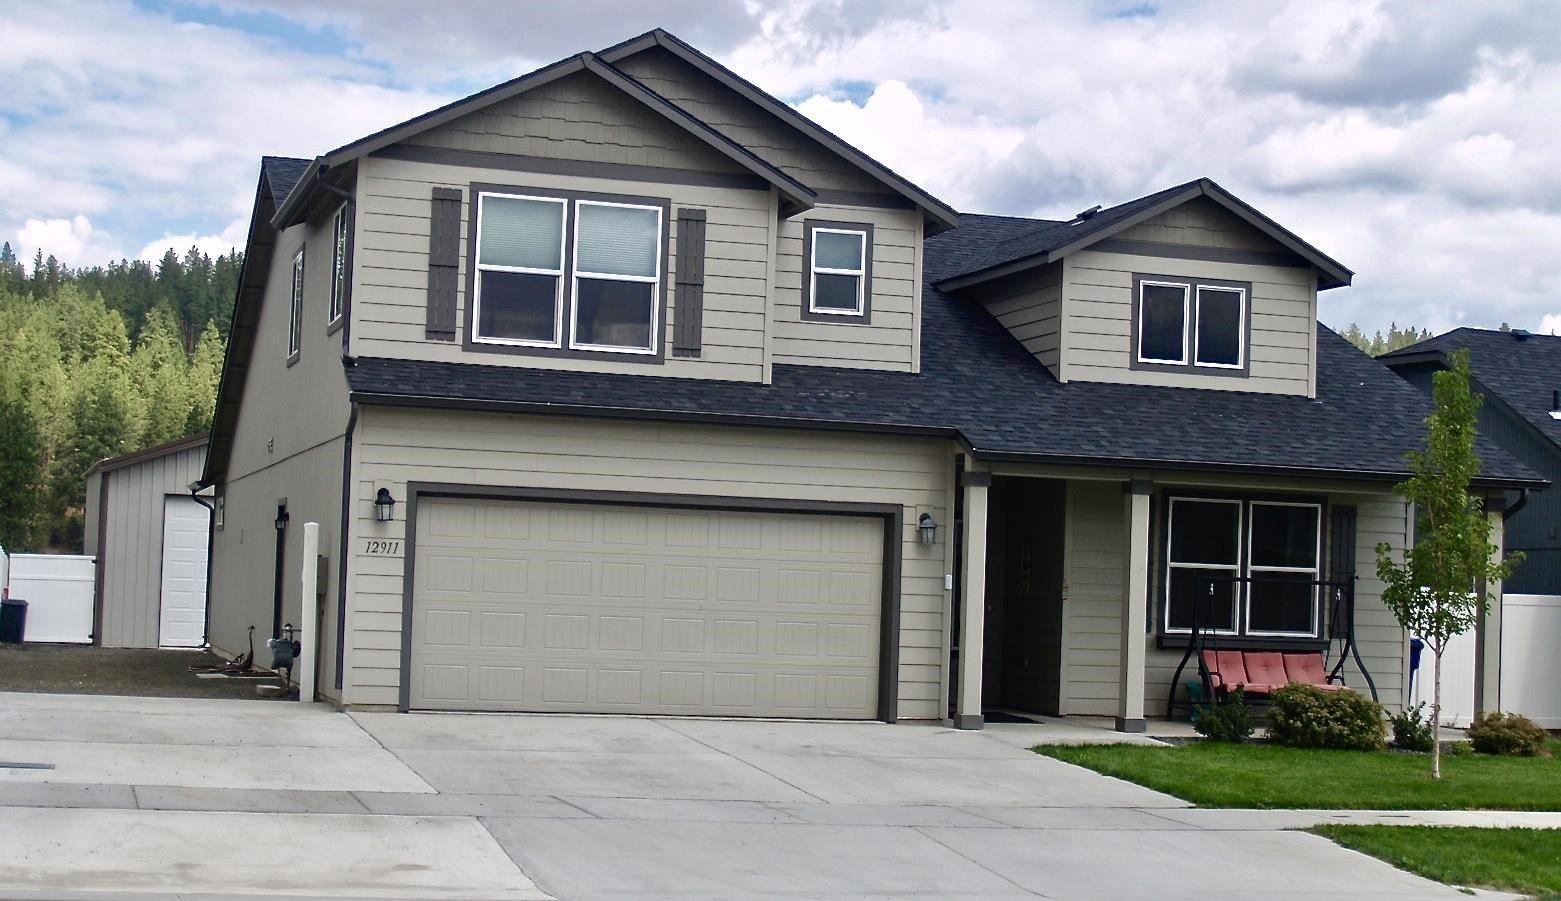 12911 E Wabash Ct, Spokane Valley, WA 99216 - #: 202122188